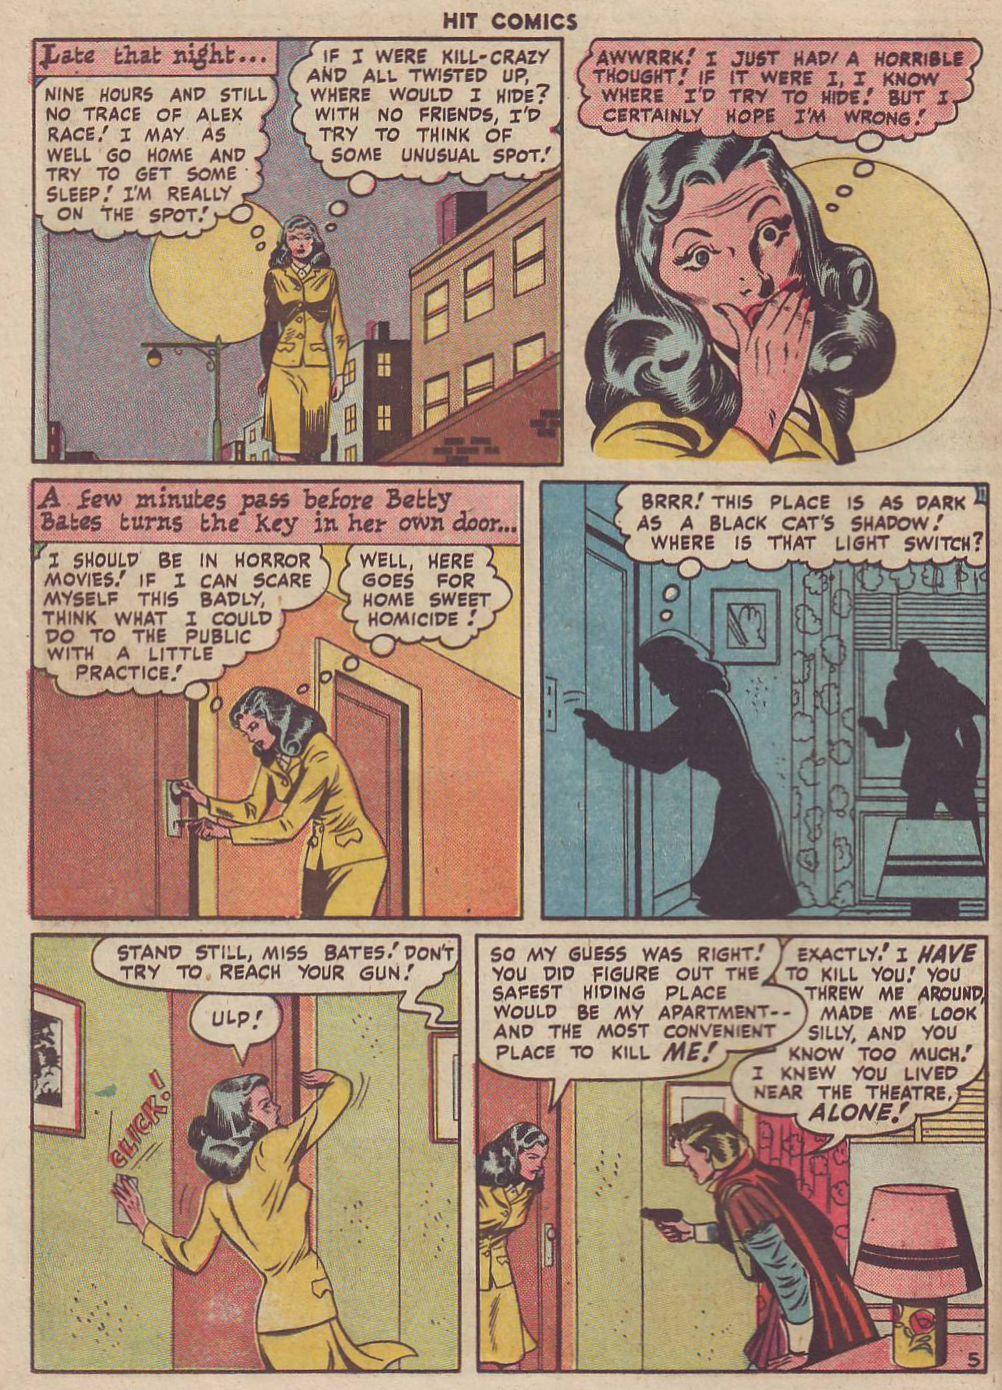 Read online Hit Comics comic -  Issue #51 - 30